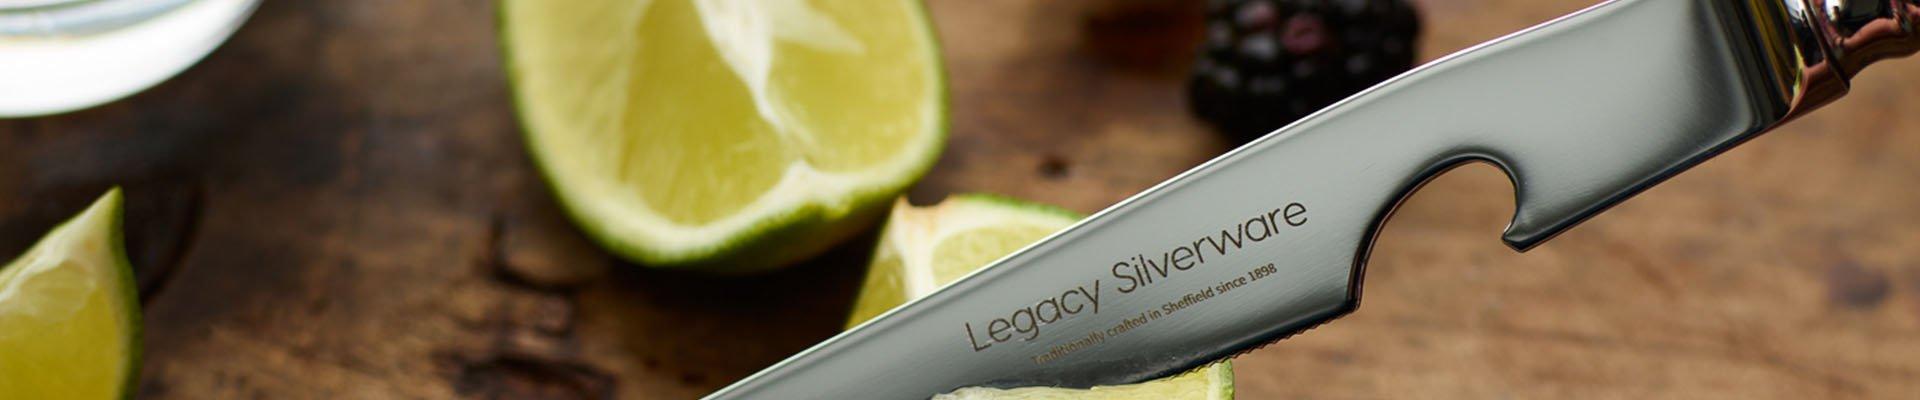 Legacy Silverware